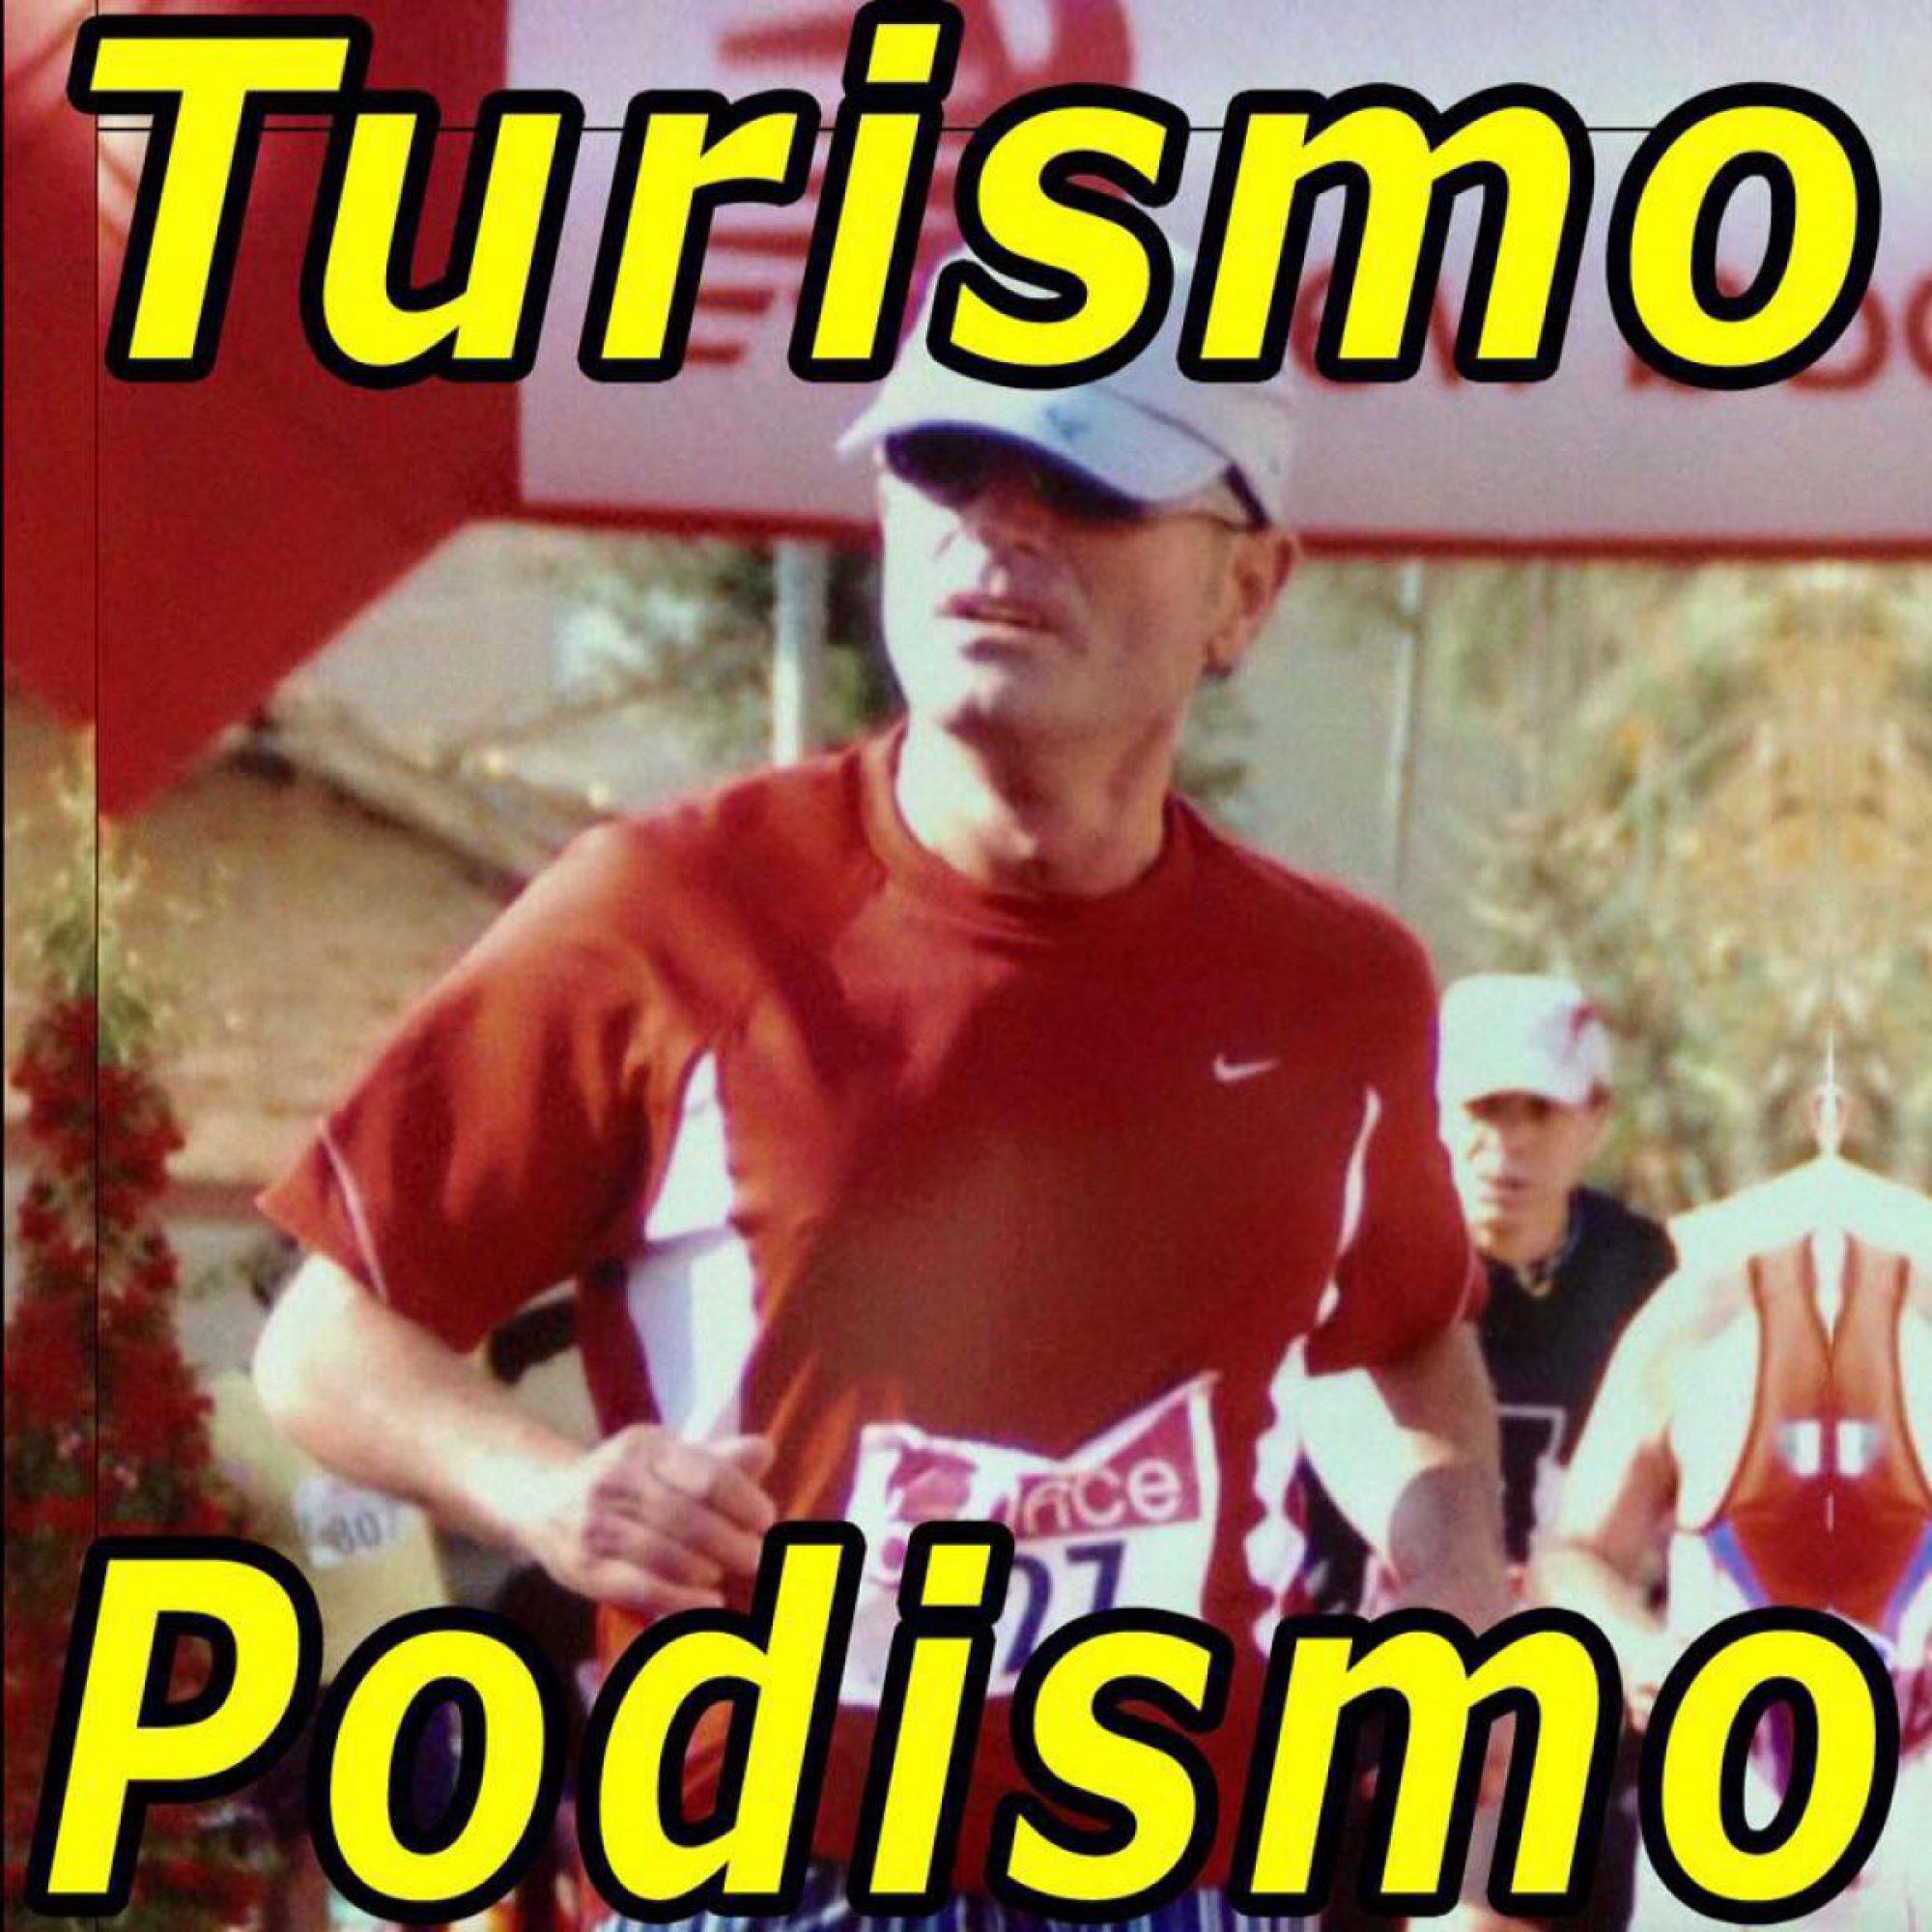 Turismo Podismo